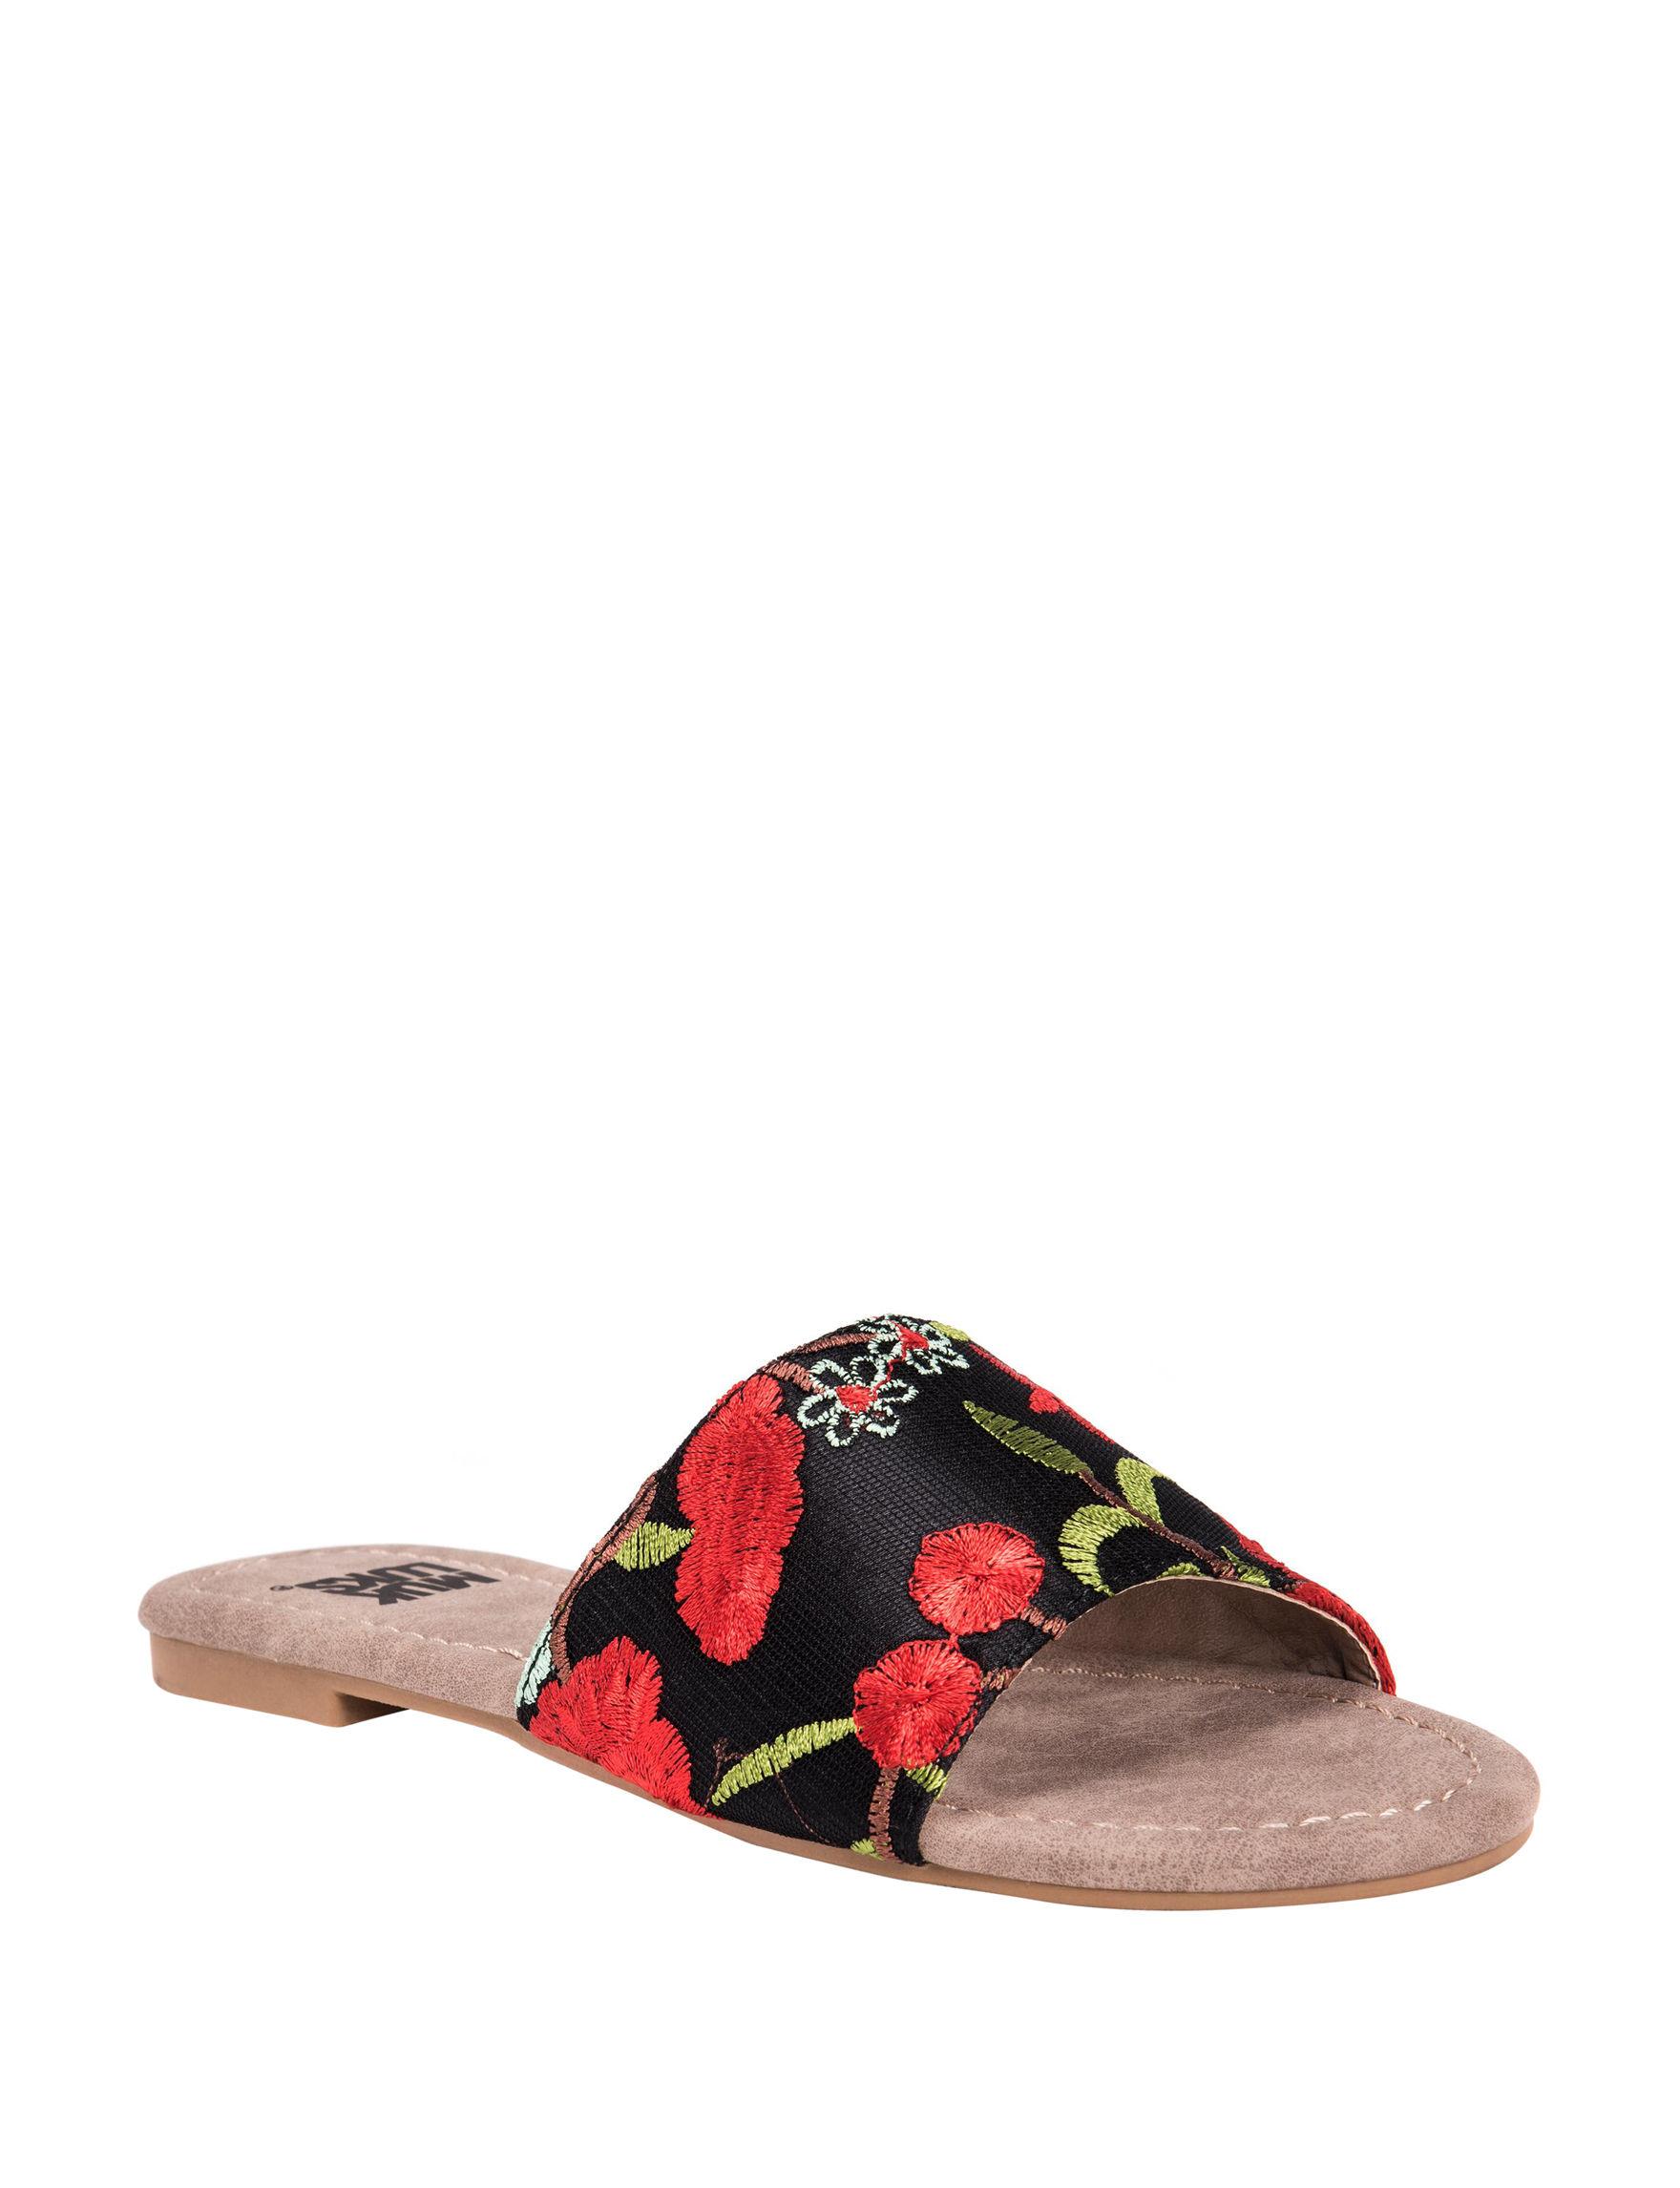 Muk Luks Multi Flat Sandals Slide Sandals